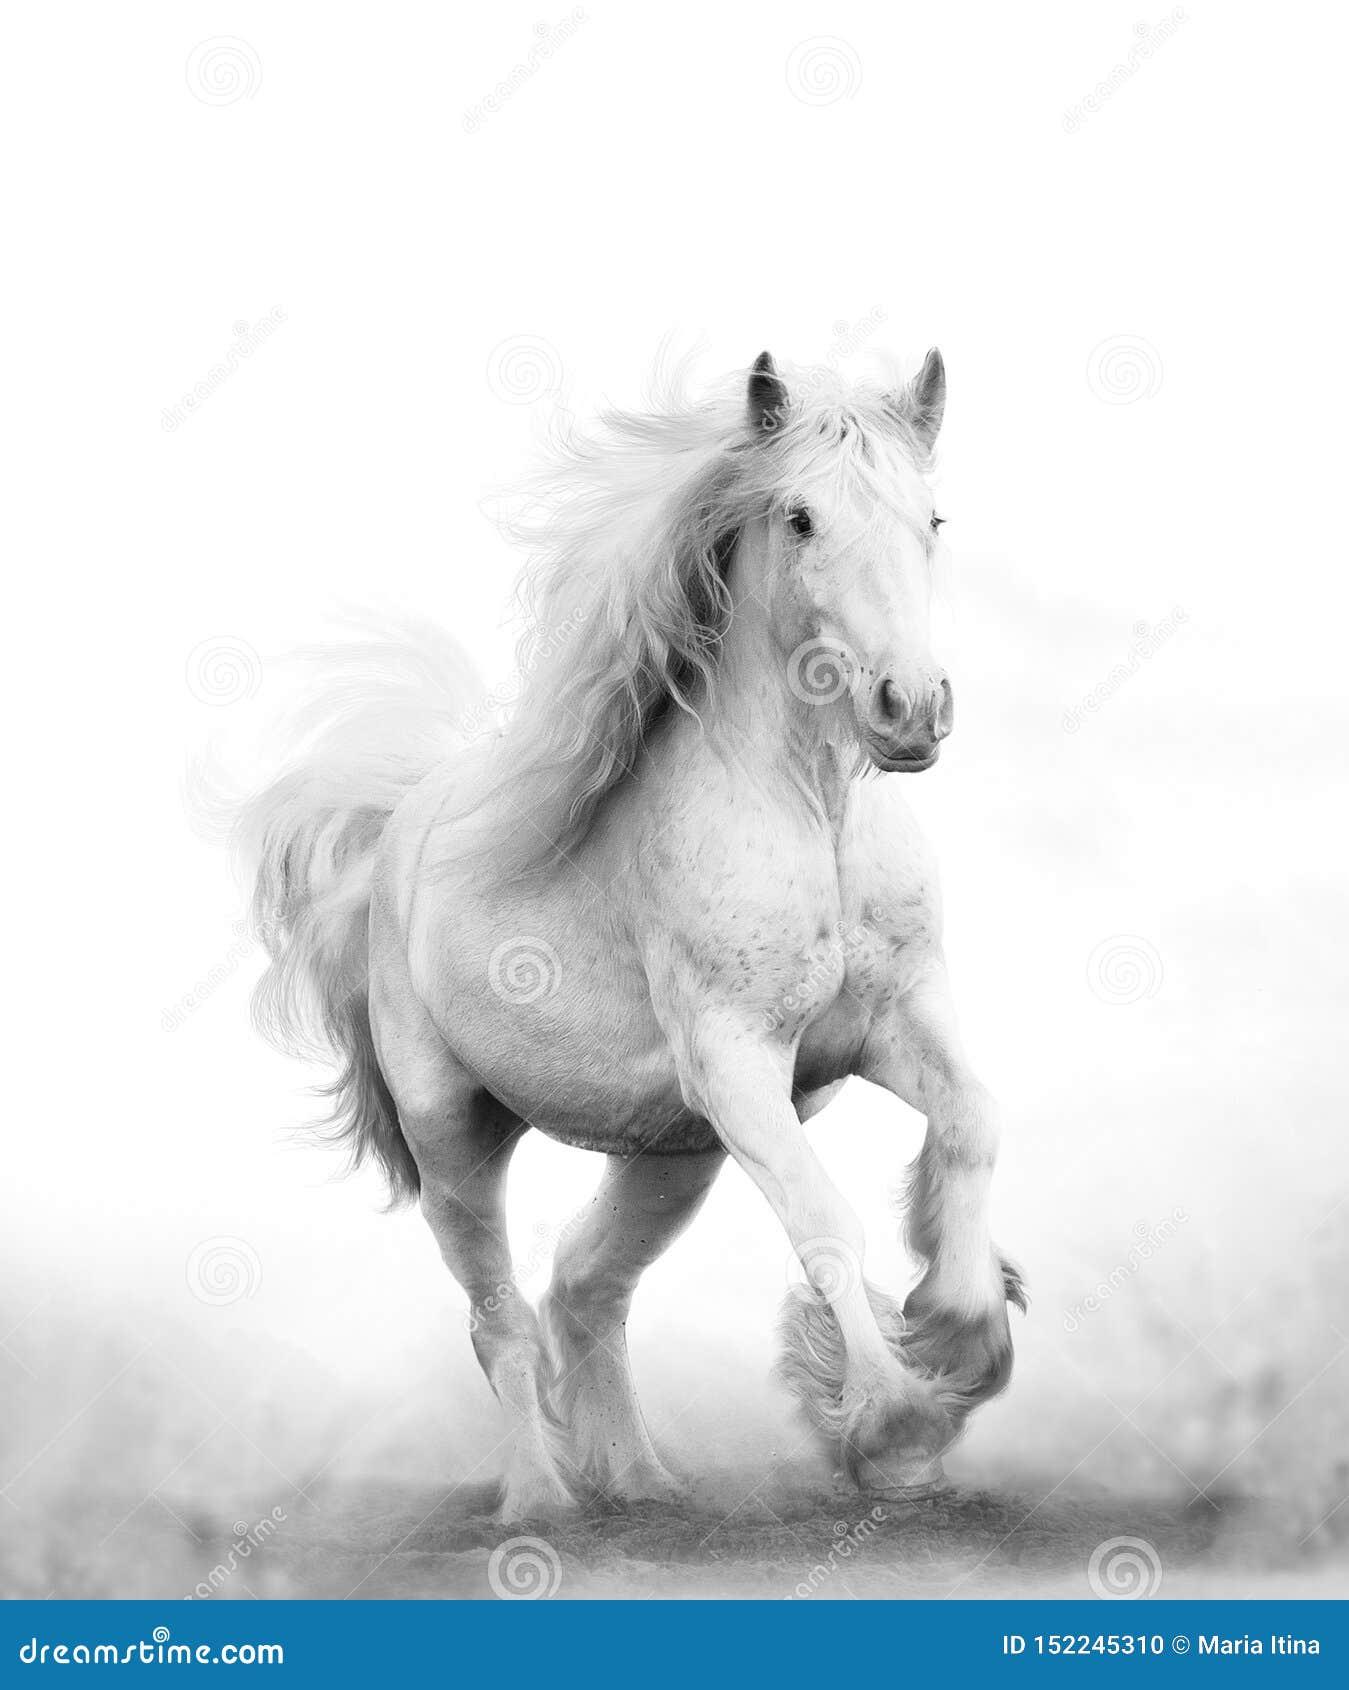 Beautiful Snow White Horse Running Stock Photo Image Of Activity Monocromatic 152245310